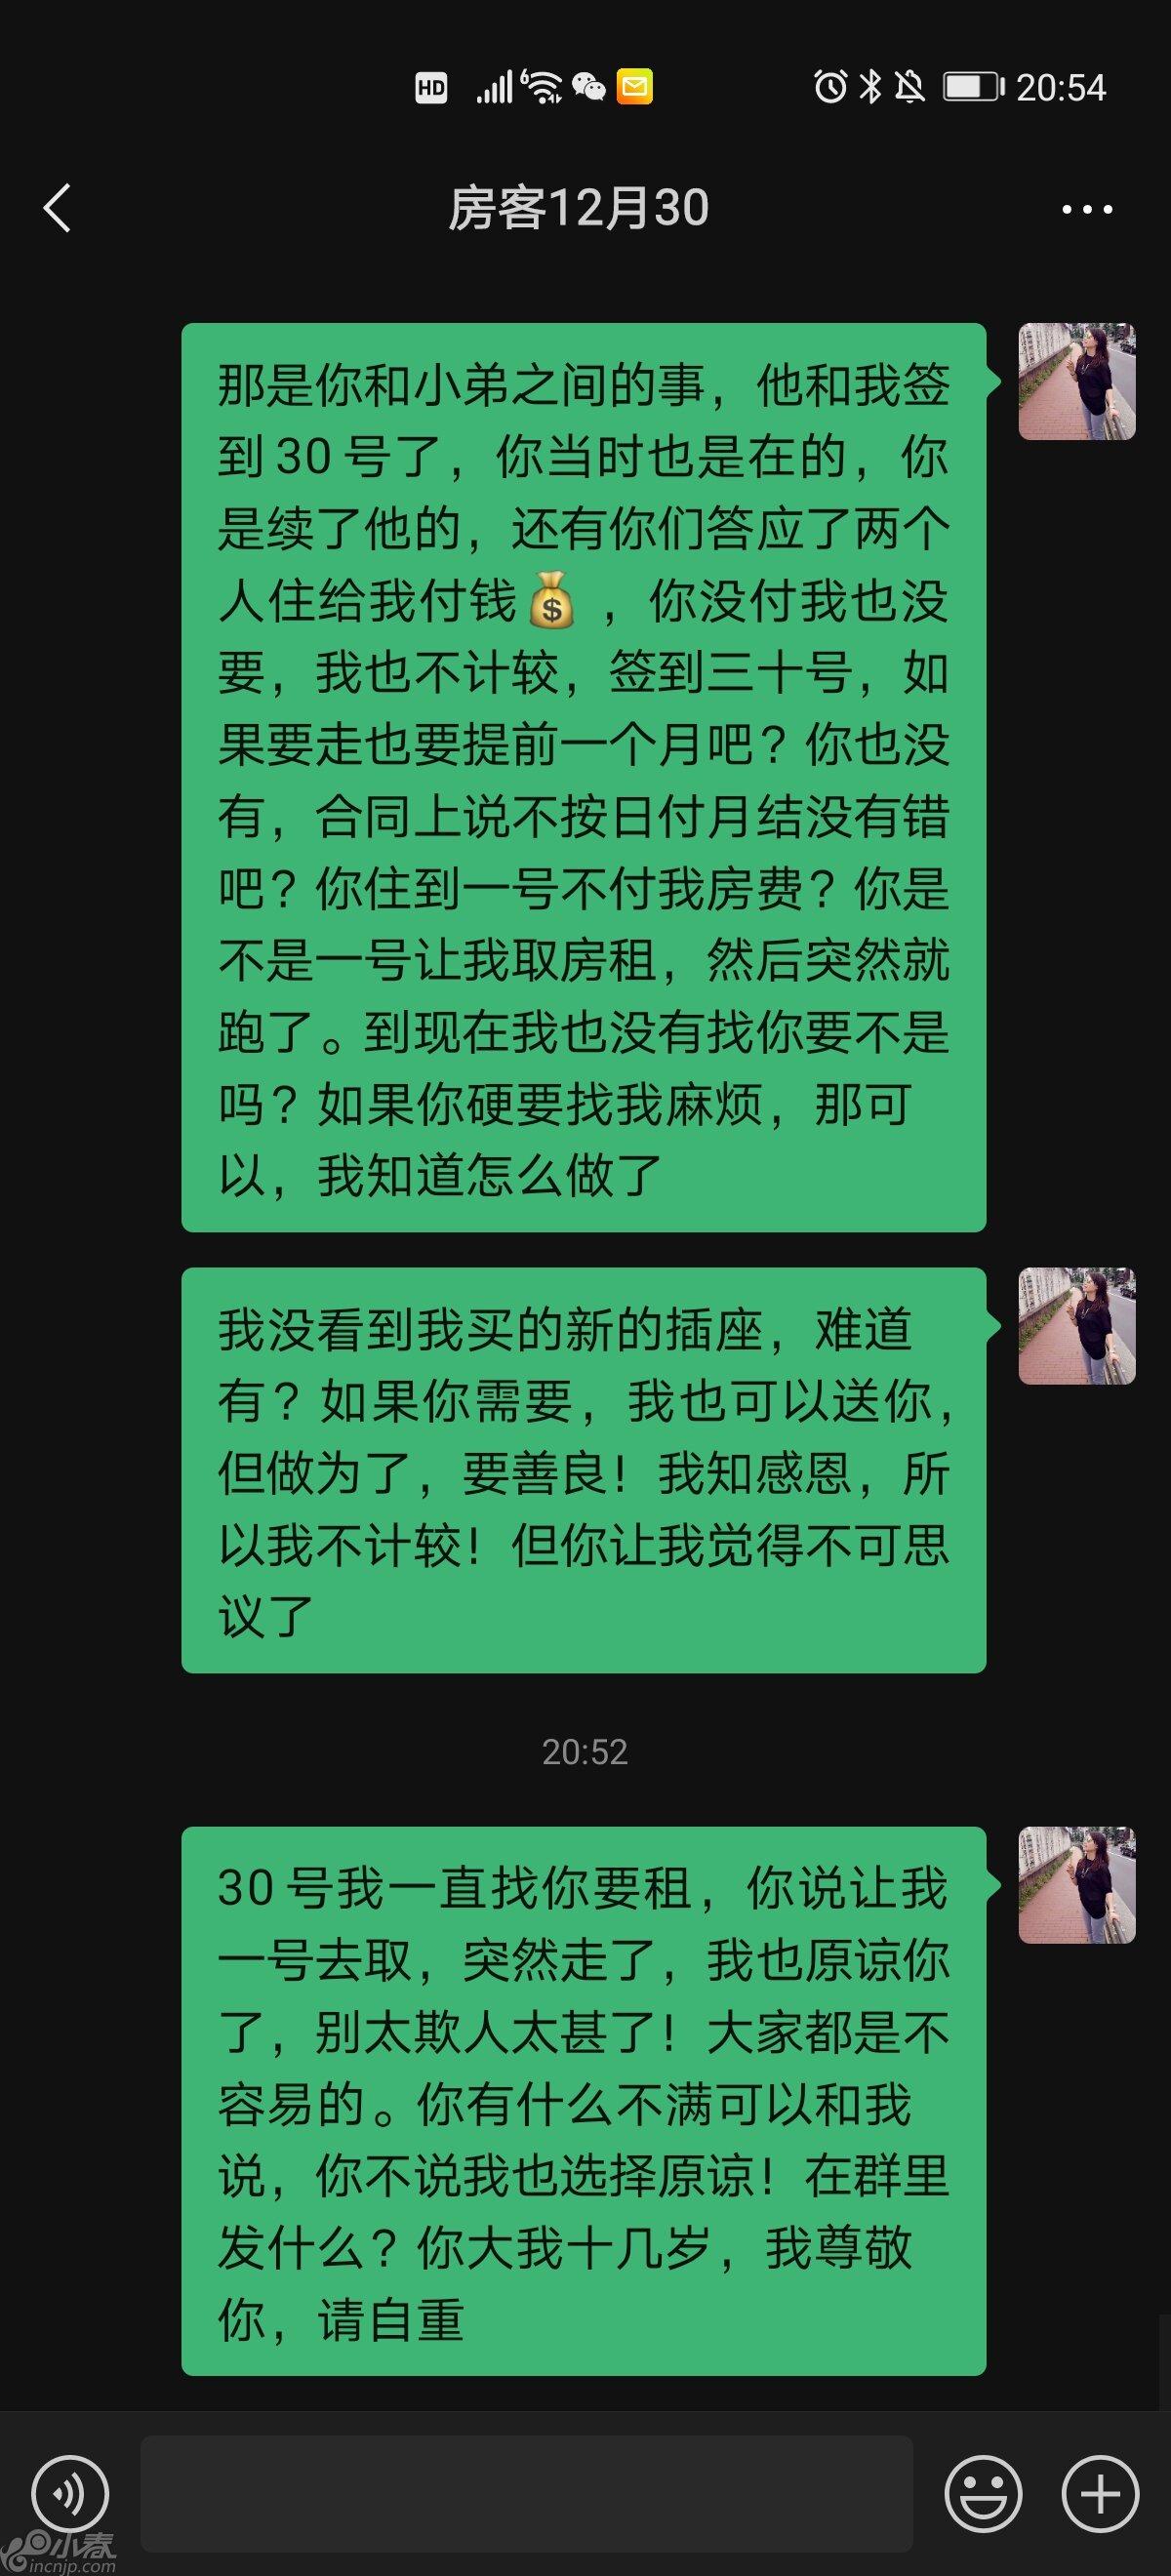 Screenshot_20210721_205413_com.tencent.mm.jpg